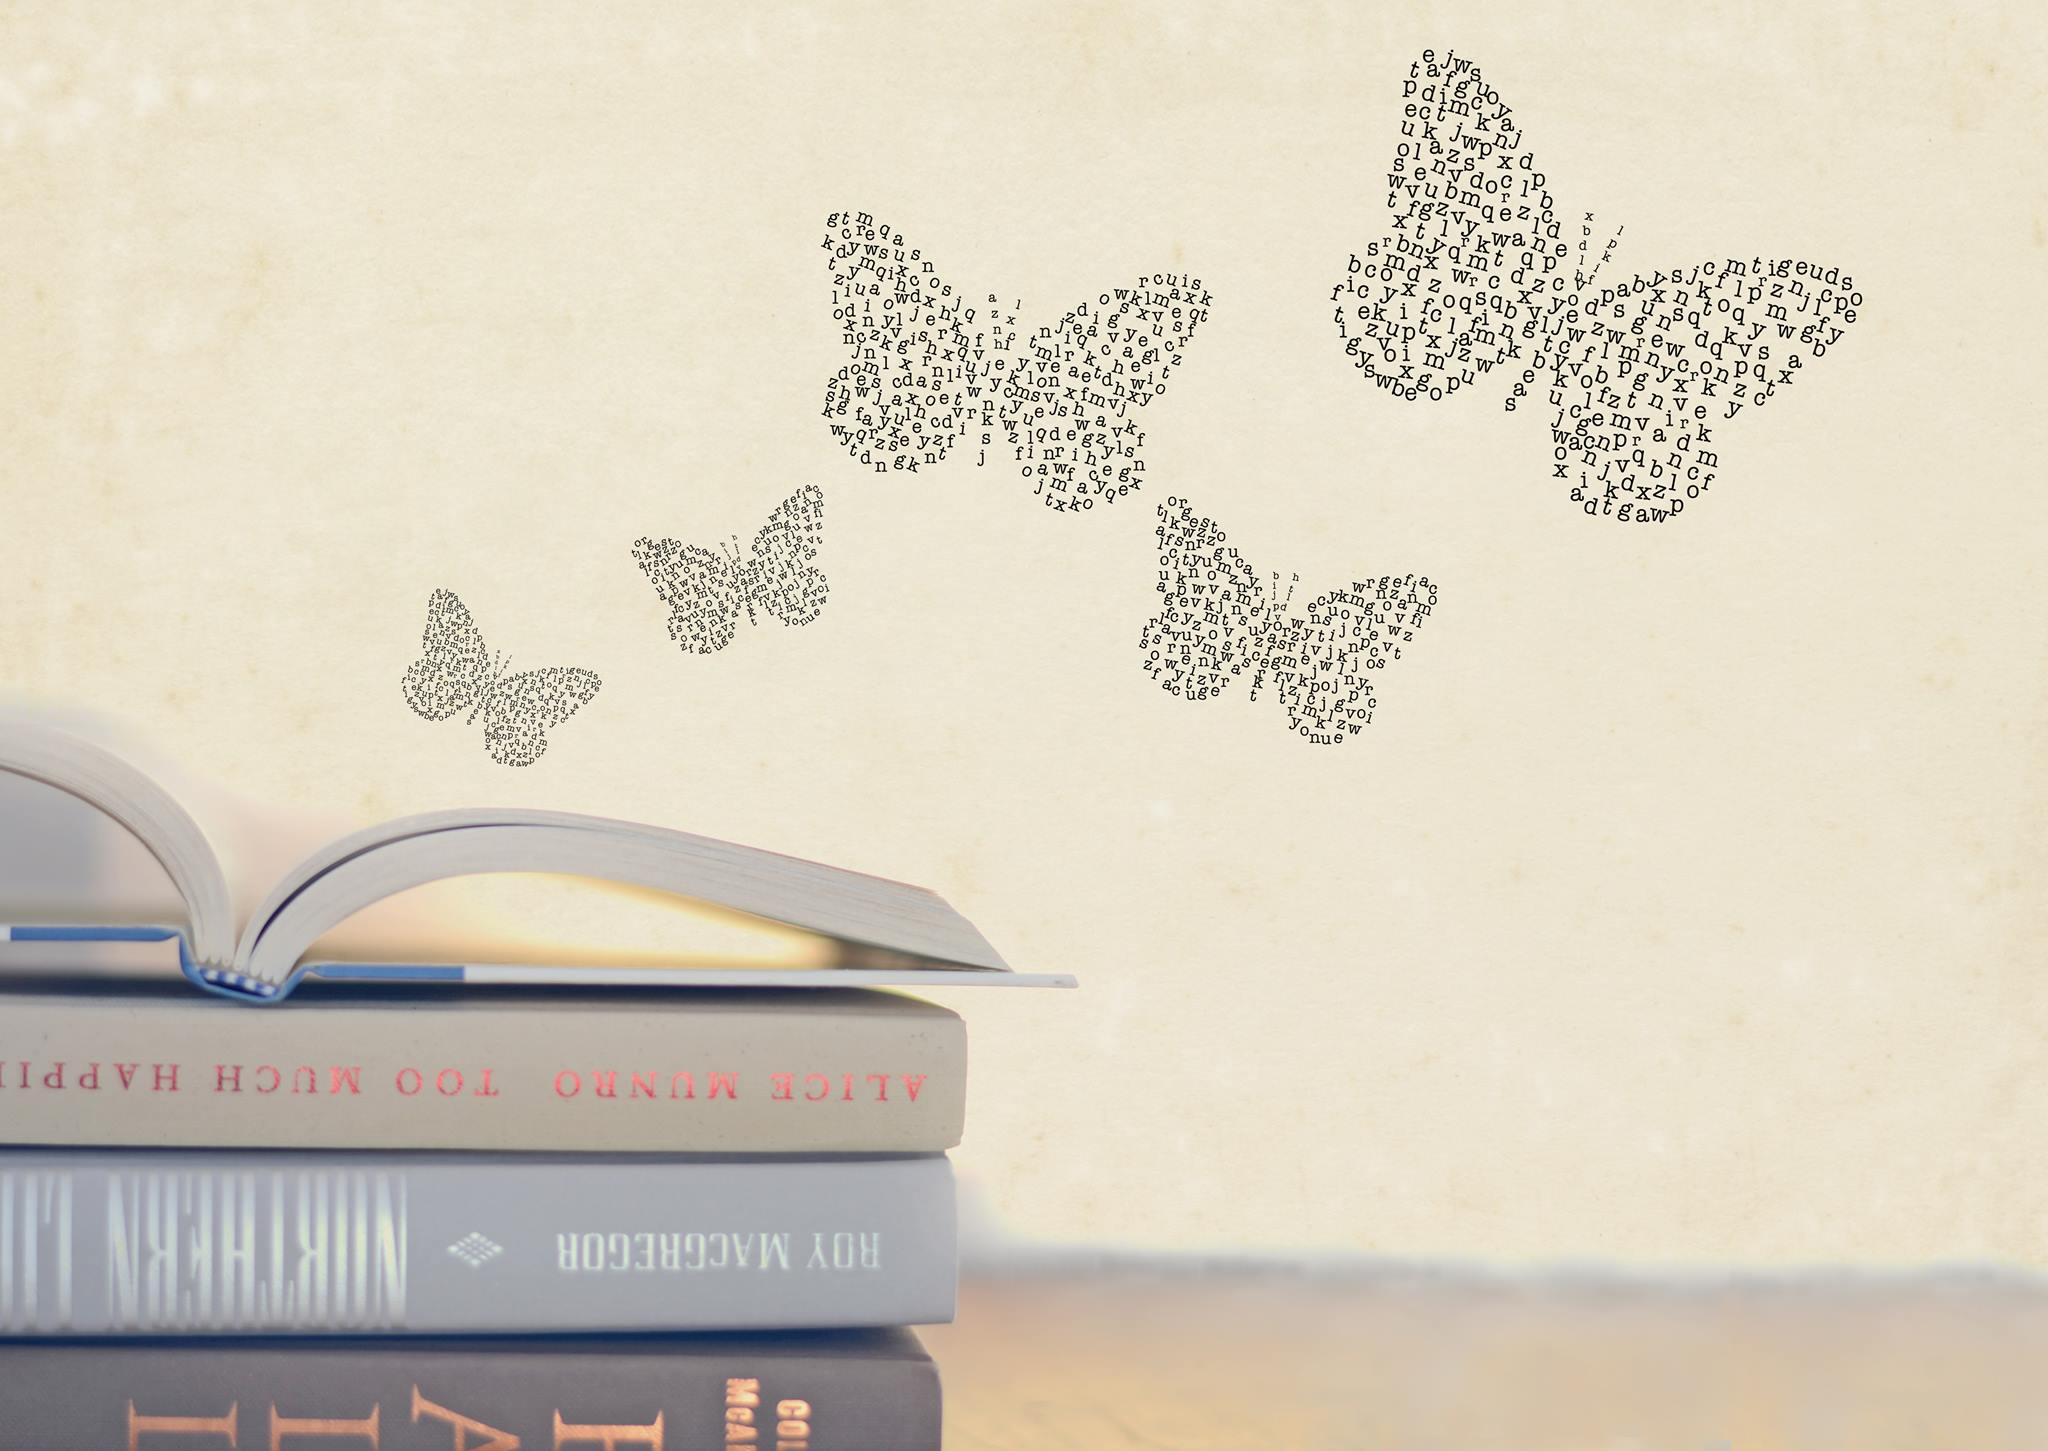 Happy 19,000 brand-new books sent!